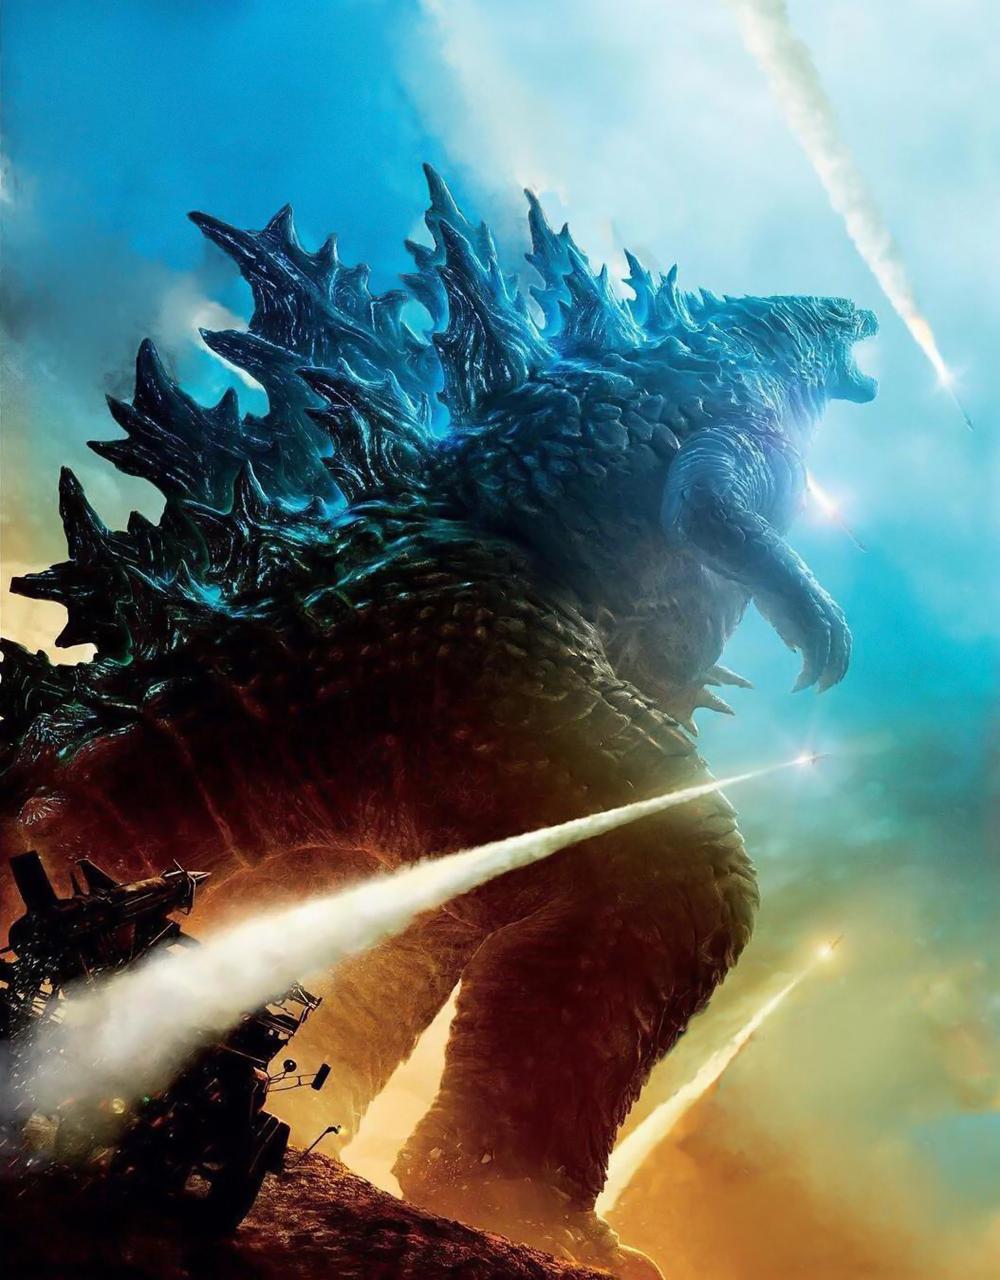 Wallpaper Godzilla King Of The Monsters Kaiju Creature Movies